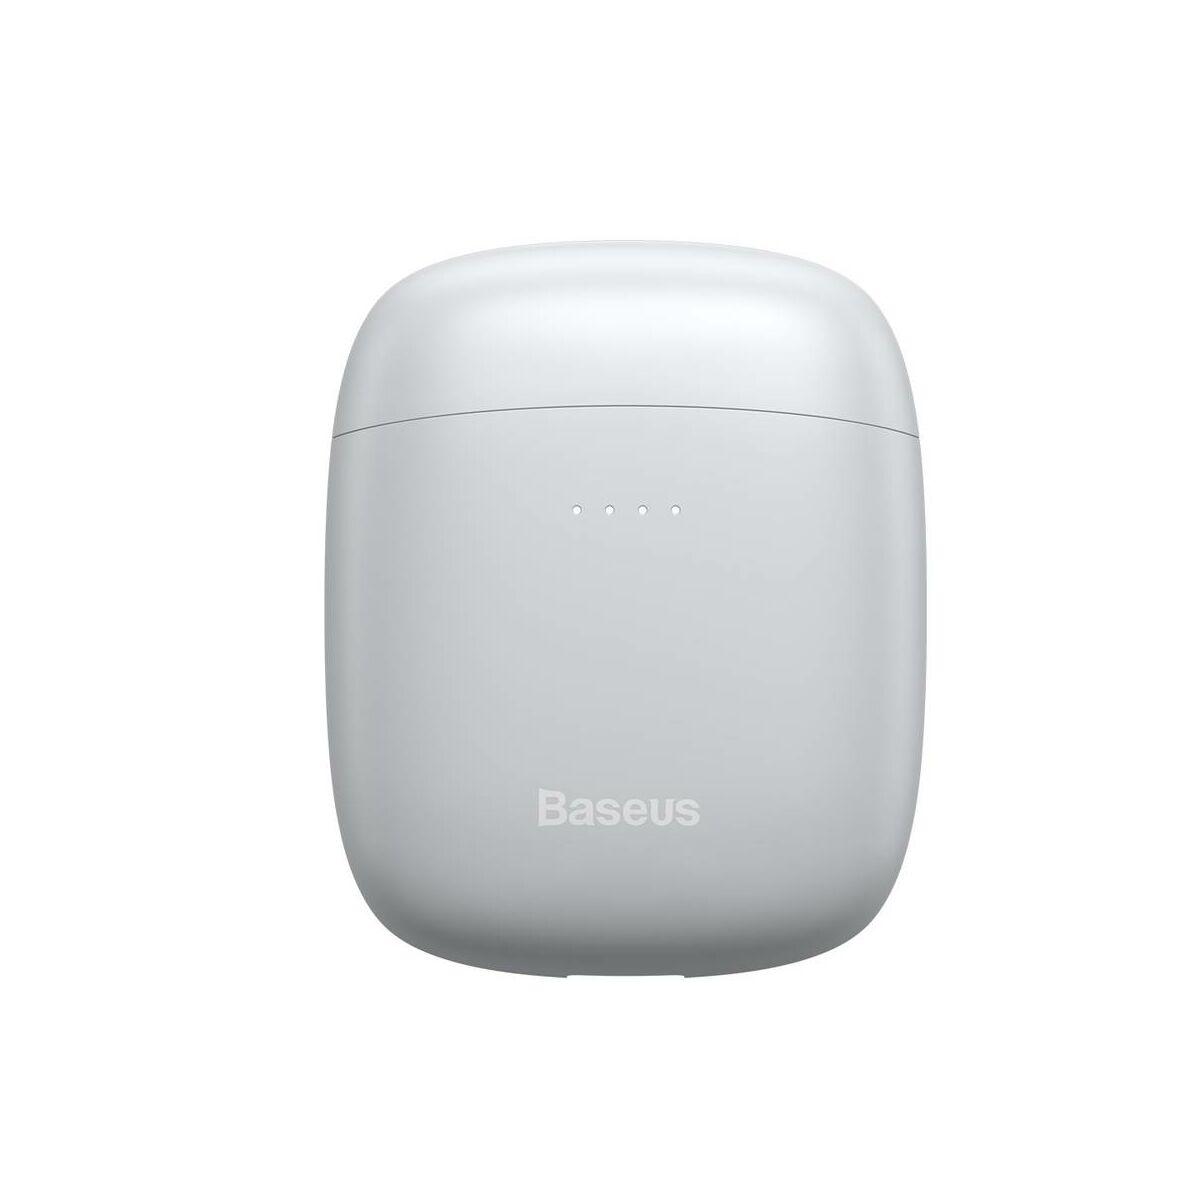 Baseus fülhallgató, Bluetooth Encok W04, PRO TWS Truly Wireless headset, fehér (NGW04P-02)